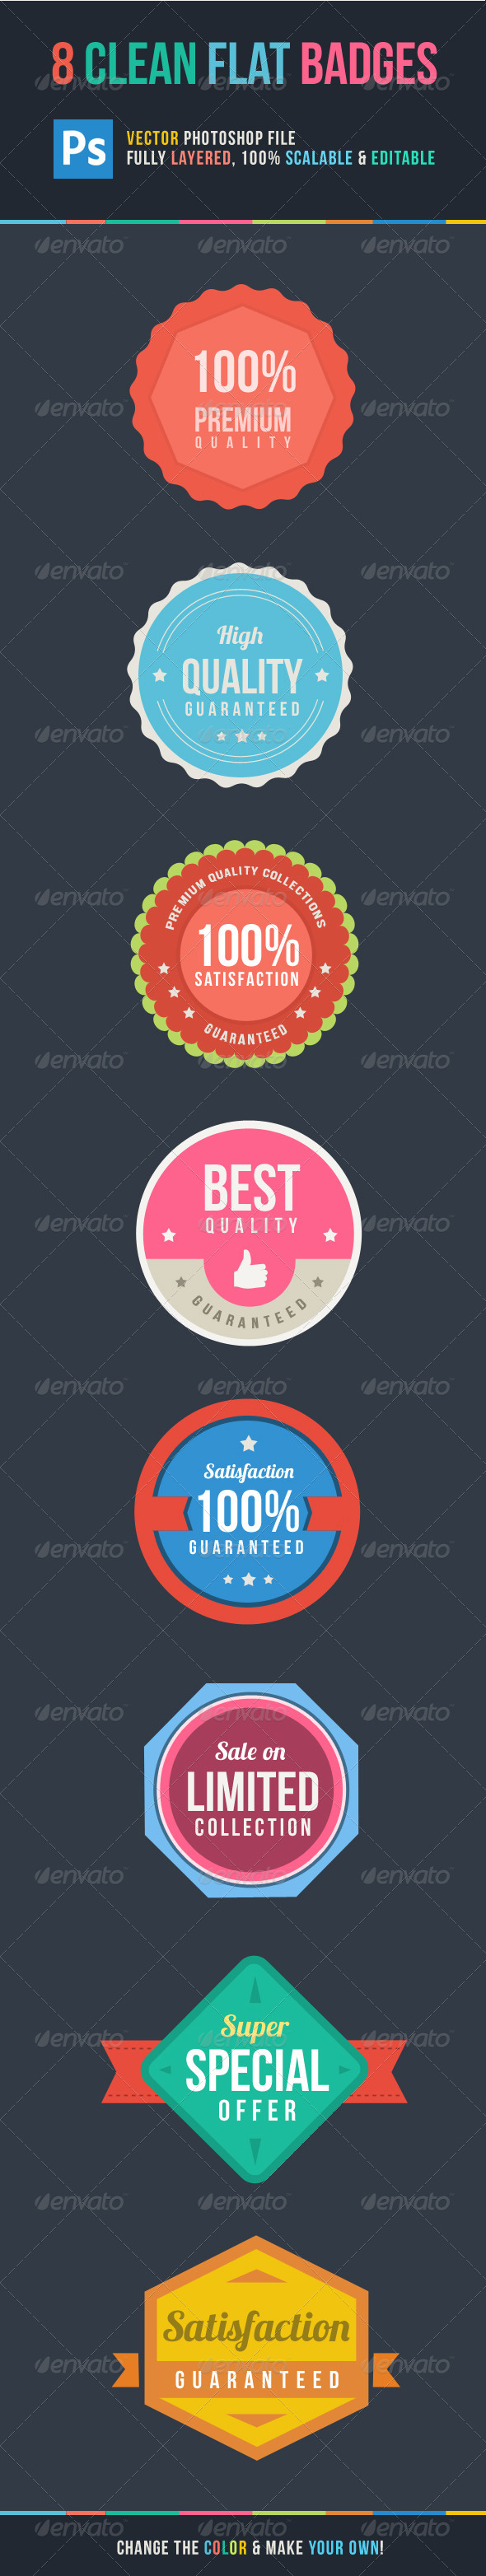 8 Clean Flat Badges - Badges & Stickers Web Elements